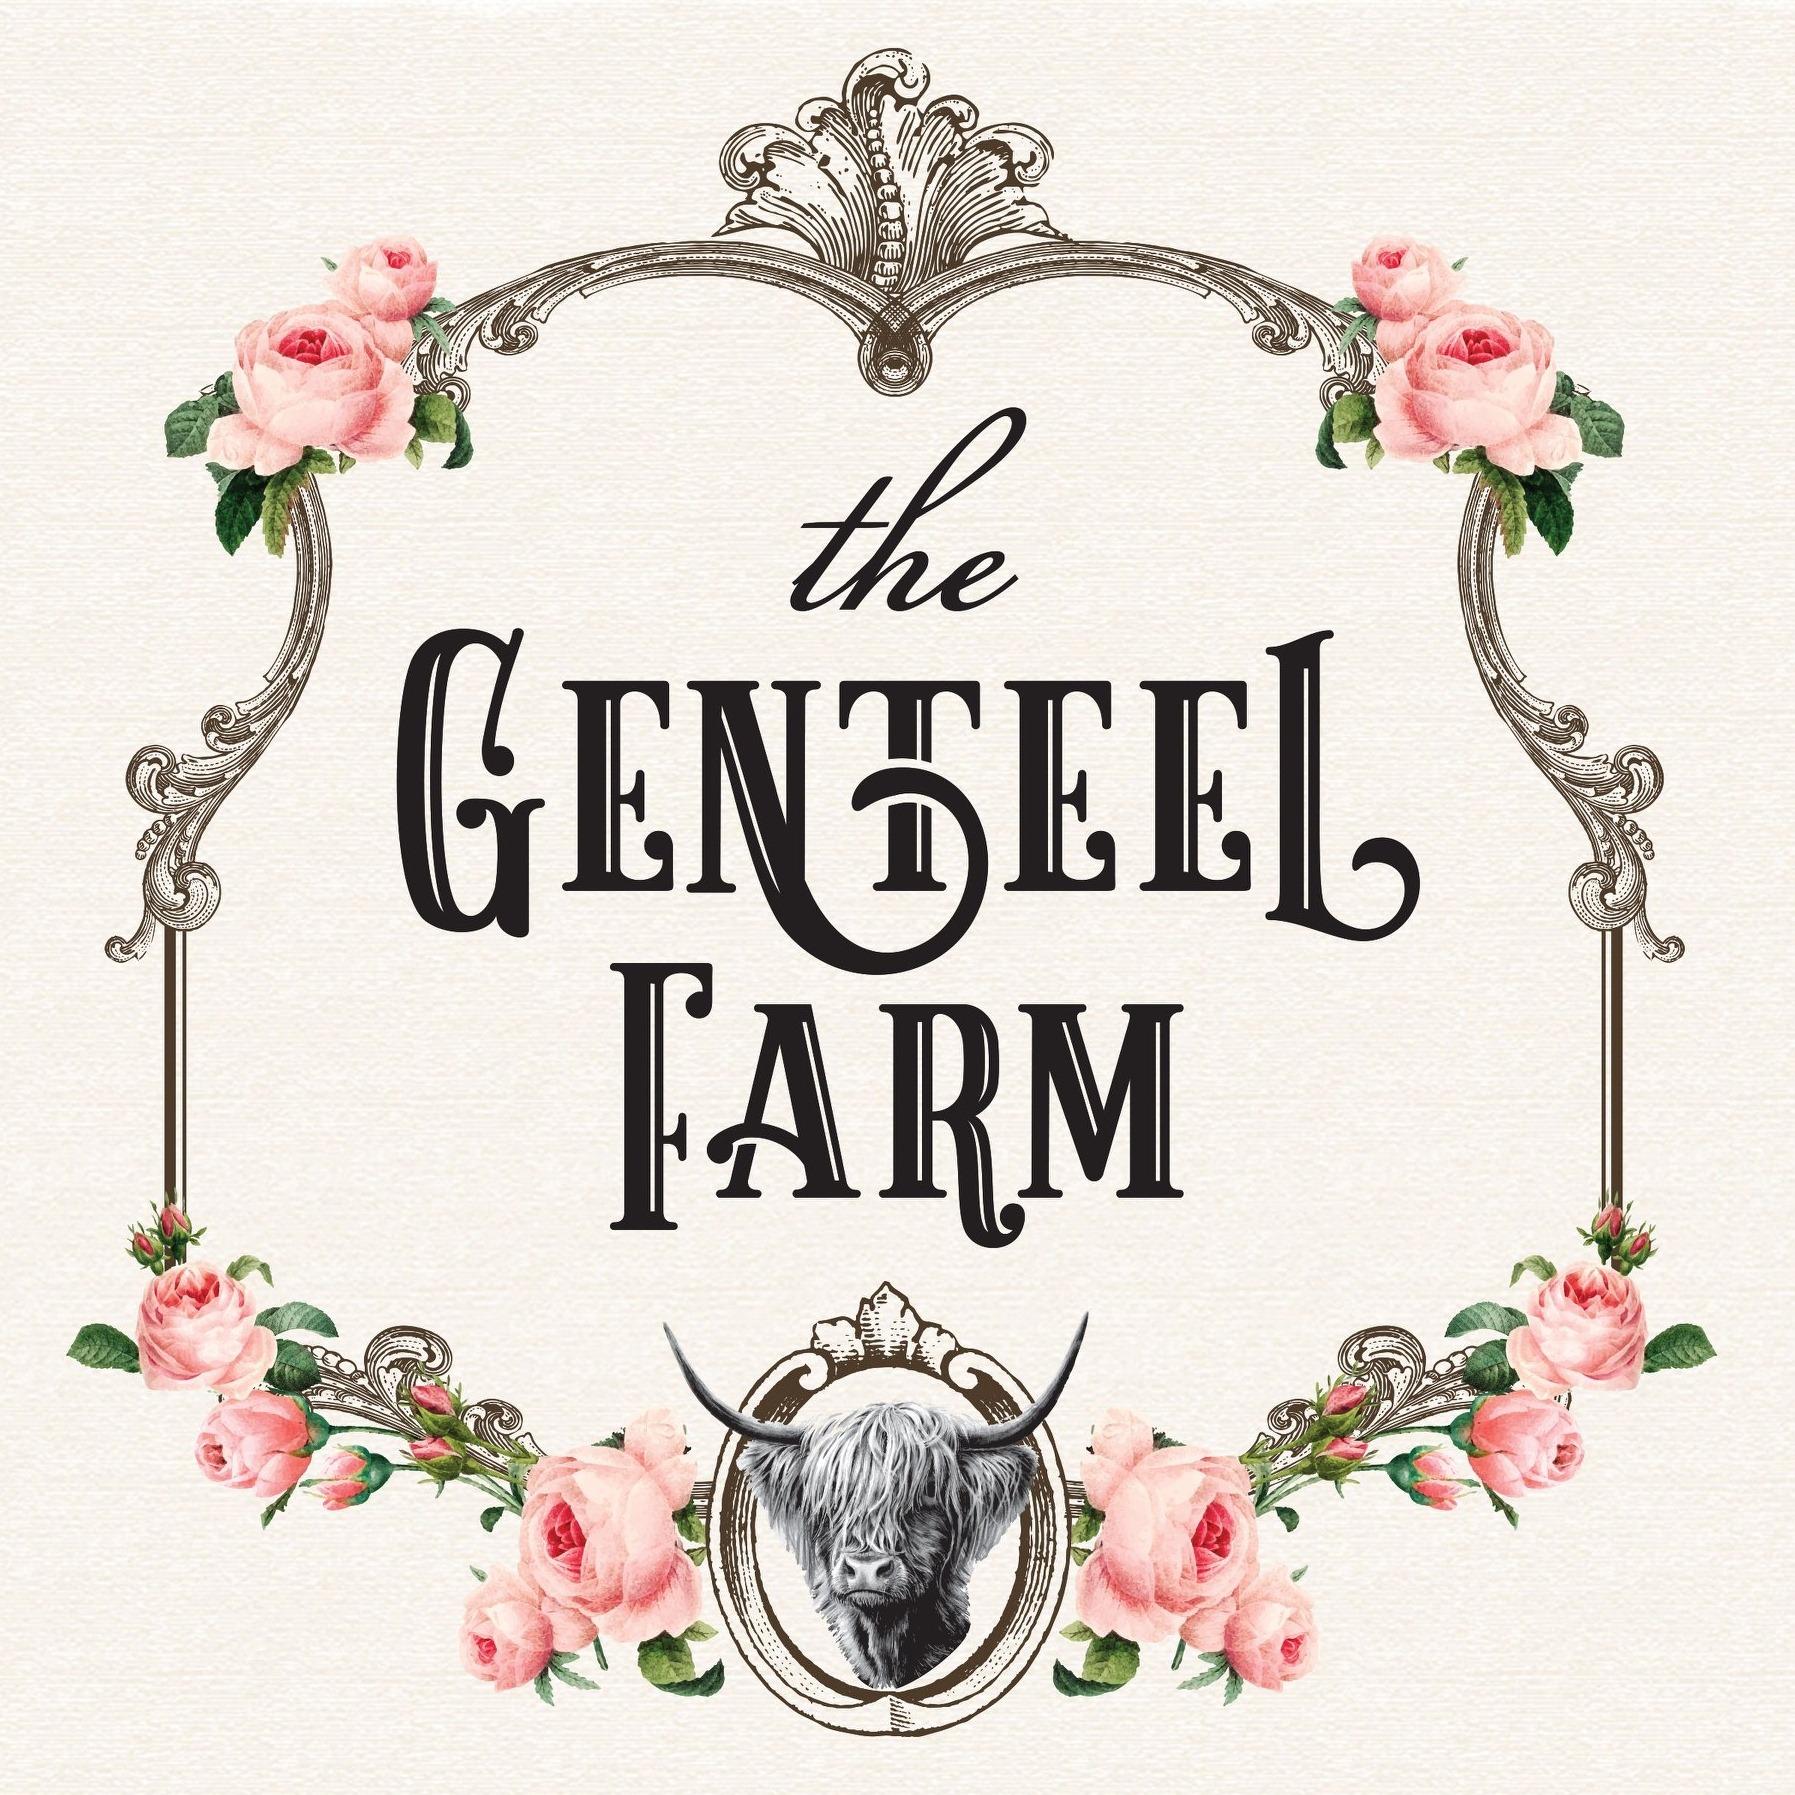 The Genteel Farm